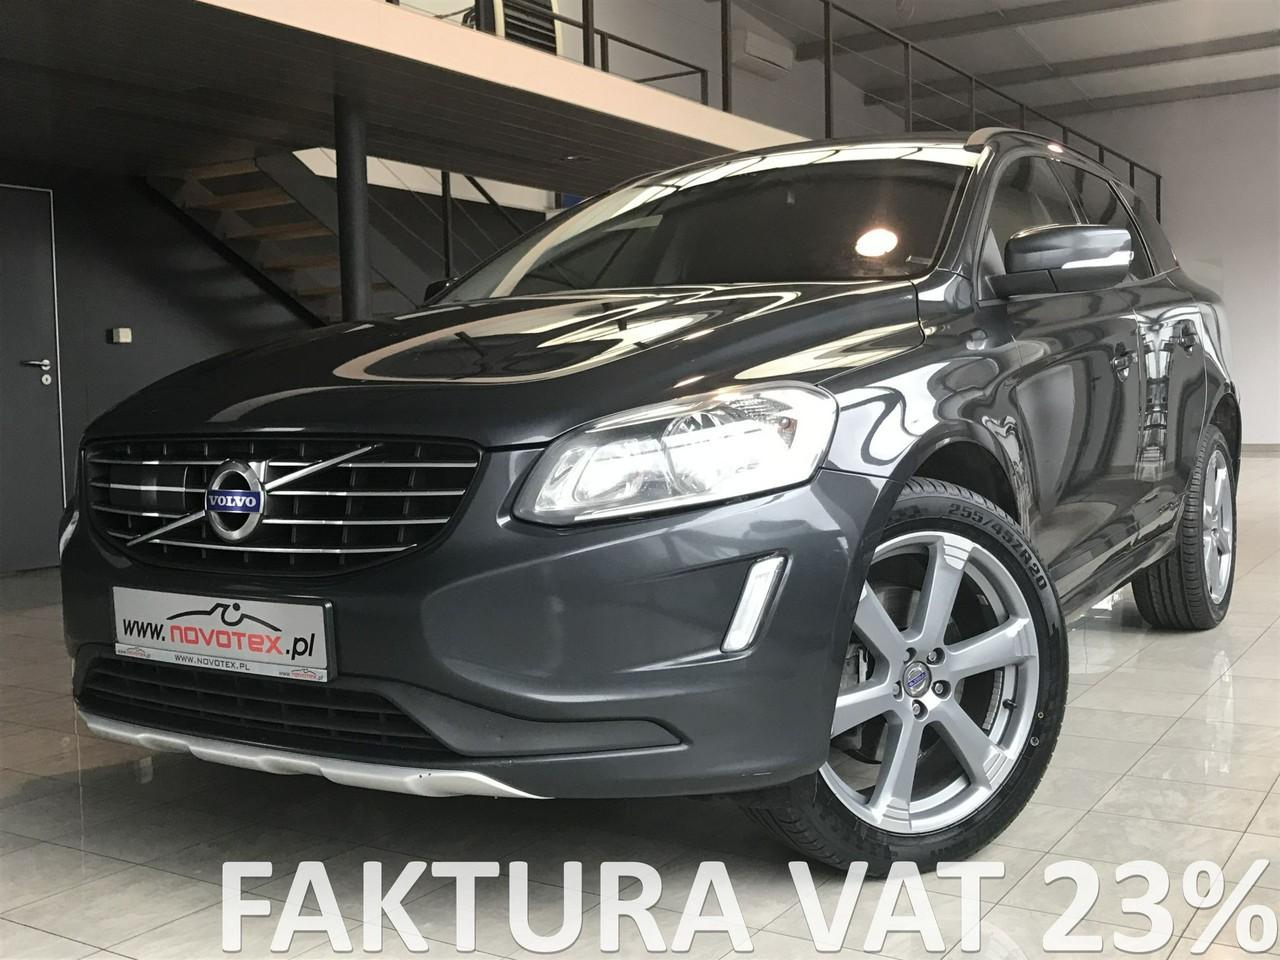 Volvo XC 60 D4*AWD*automat*ACC*BLIS*ALU 20 cali*serwis w ASO*gwarancja VIP Service